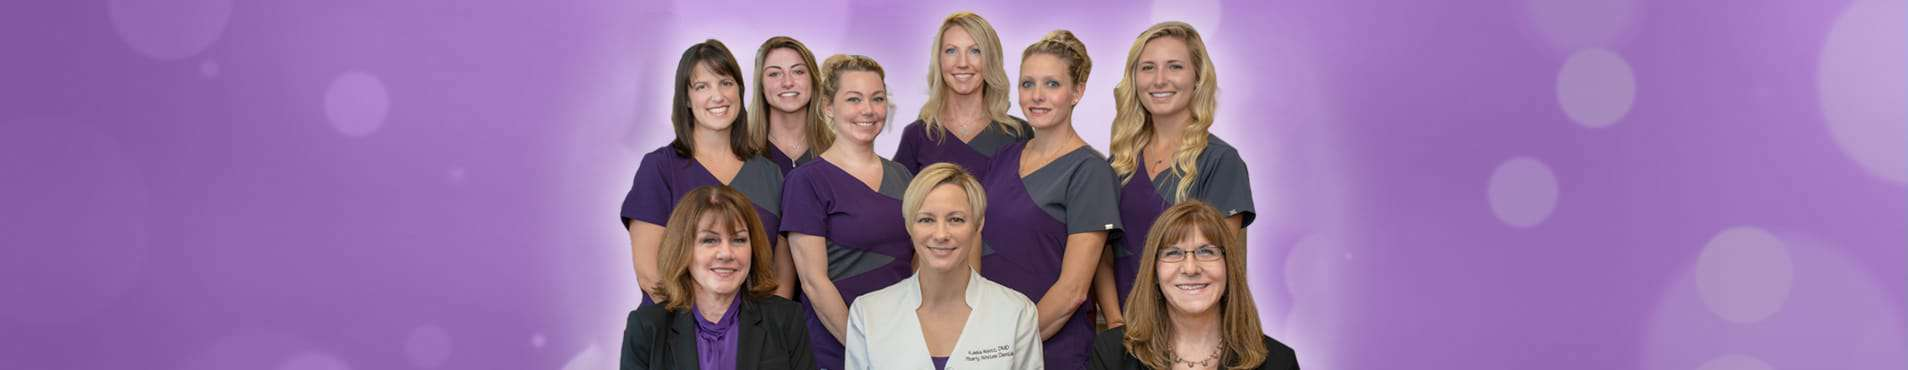 Dental Crowns Dentist Serving Penn Valley